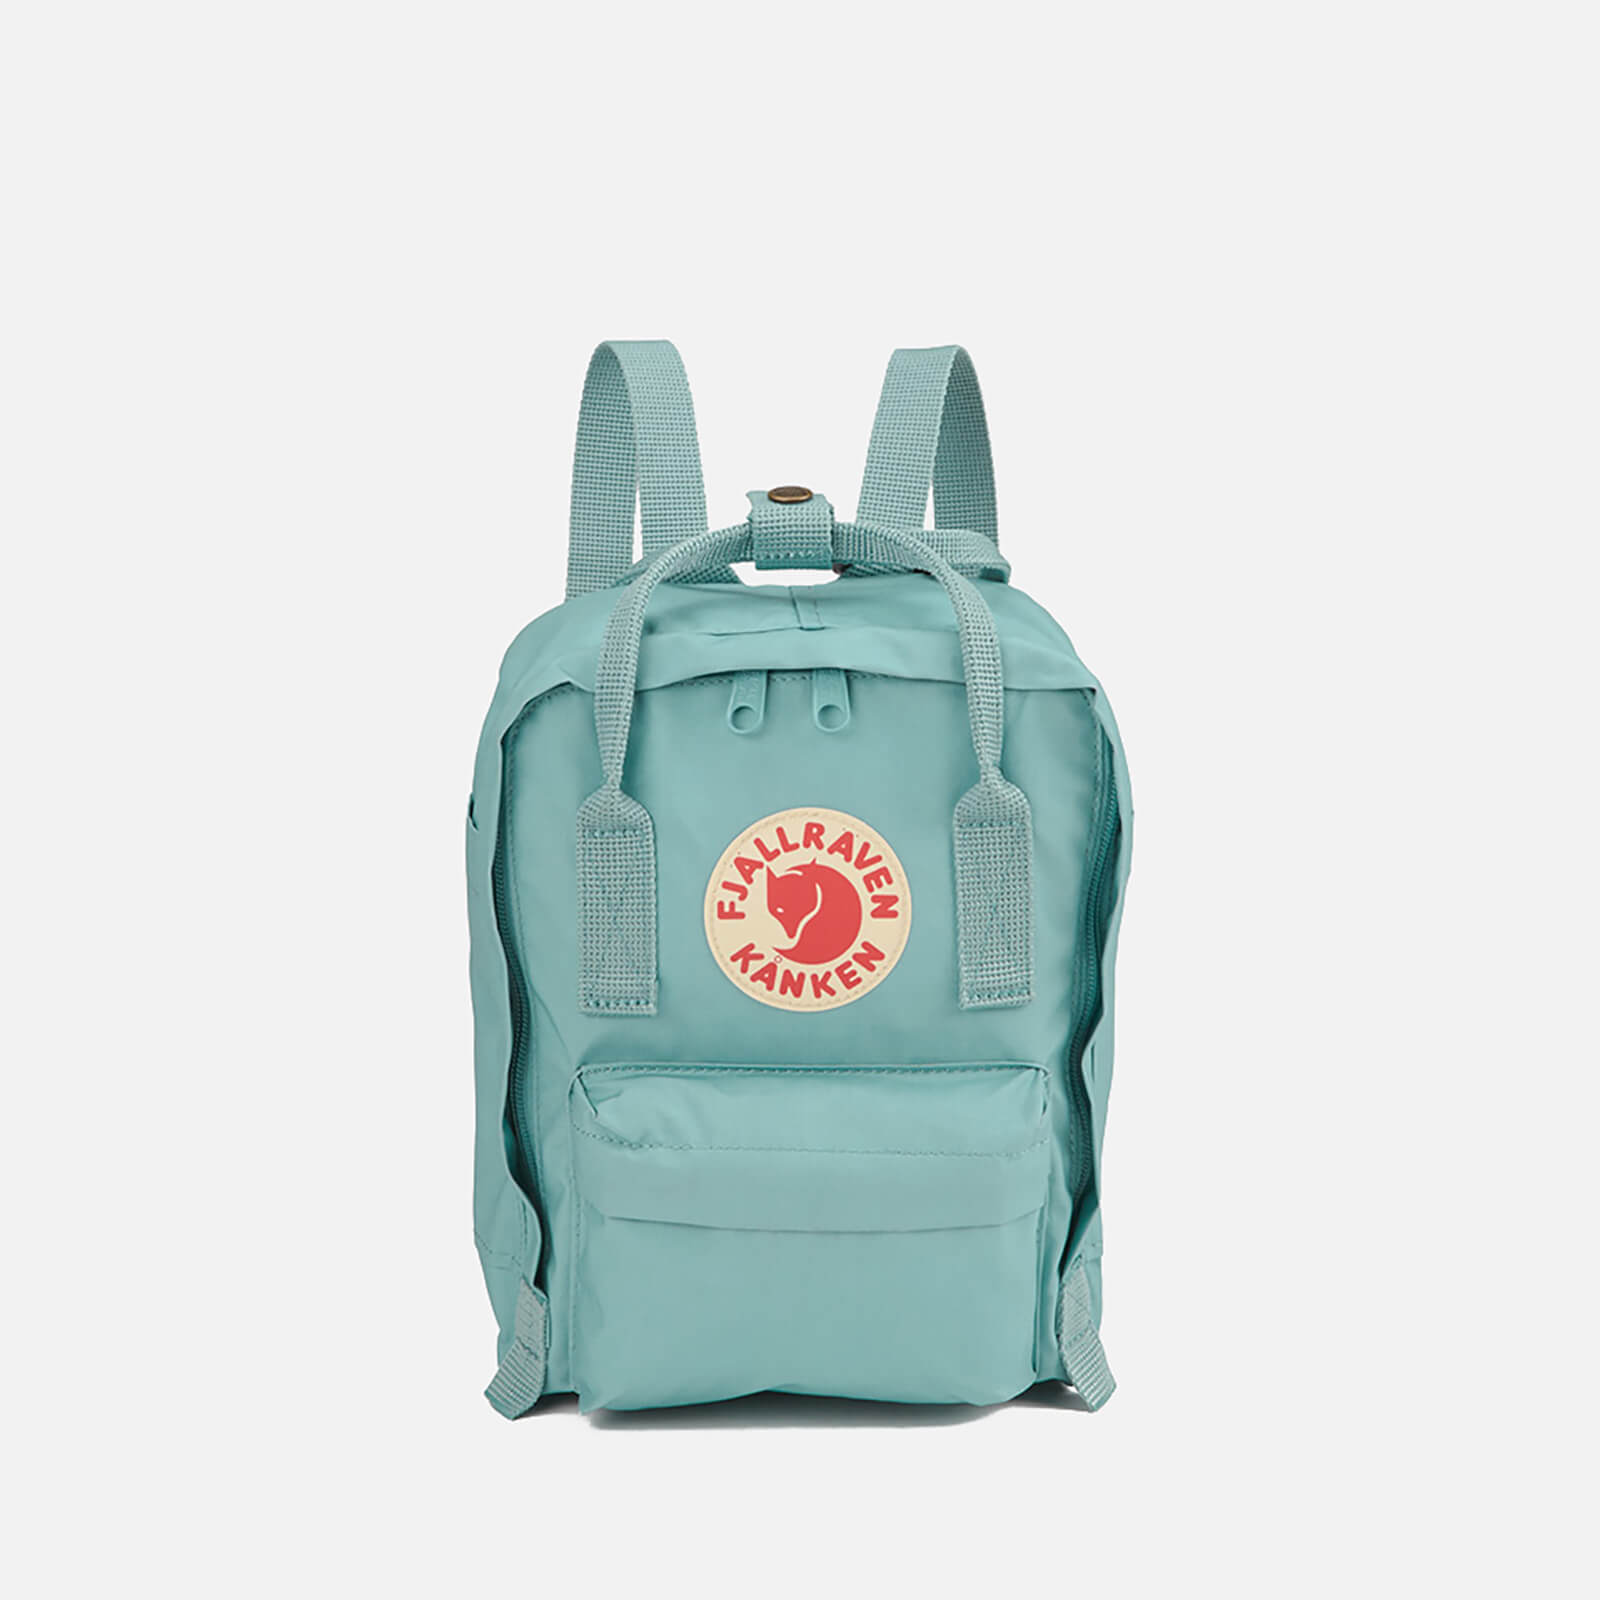 b6eaf0a4d Fjallraven Women's Mini Kanken Backpack - Sky Blue